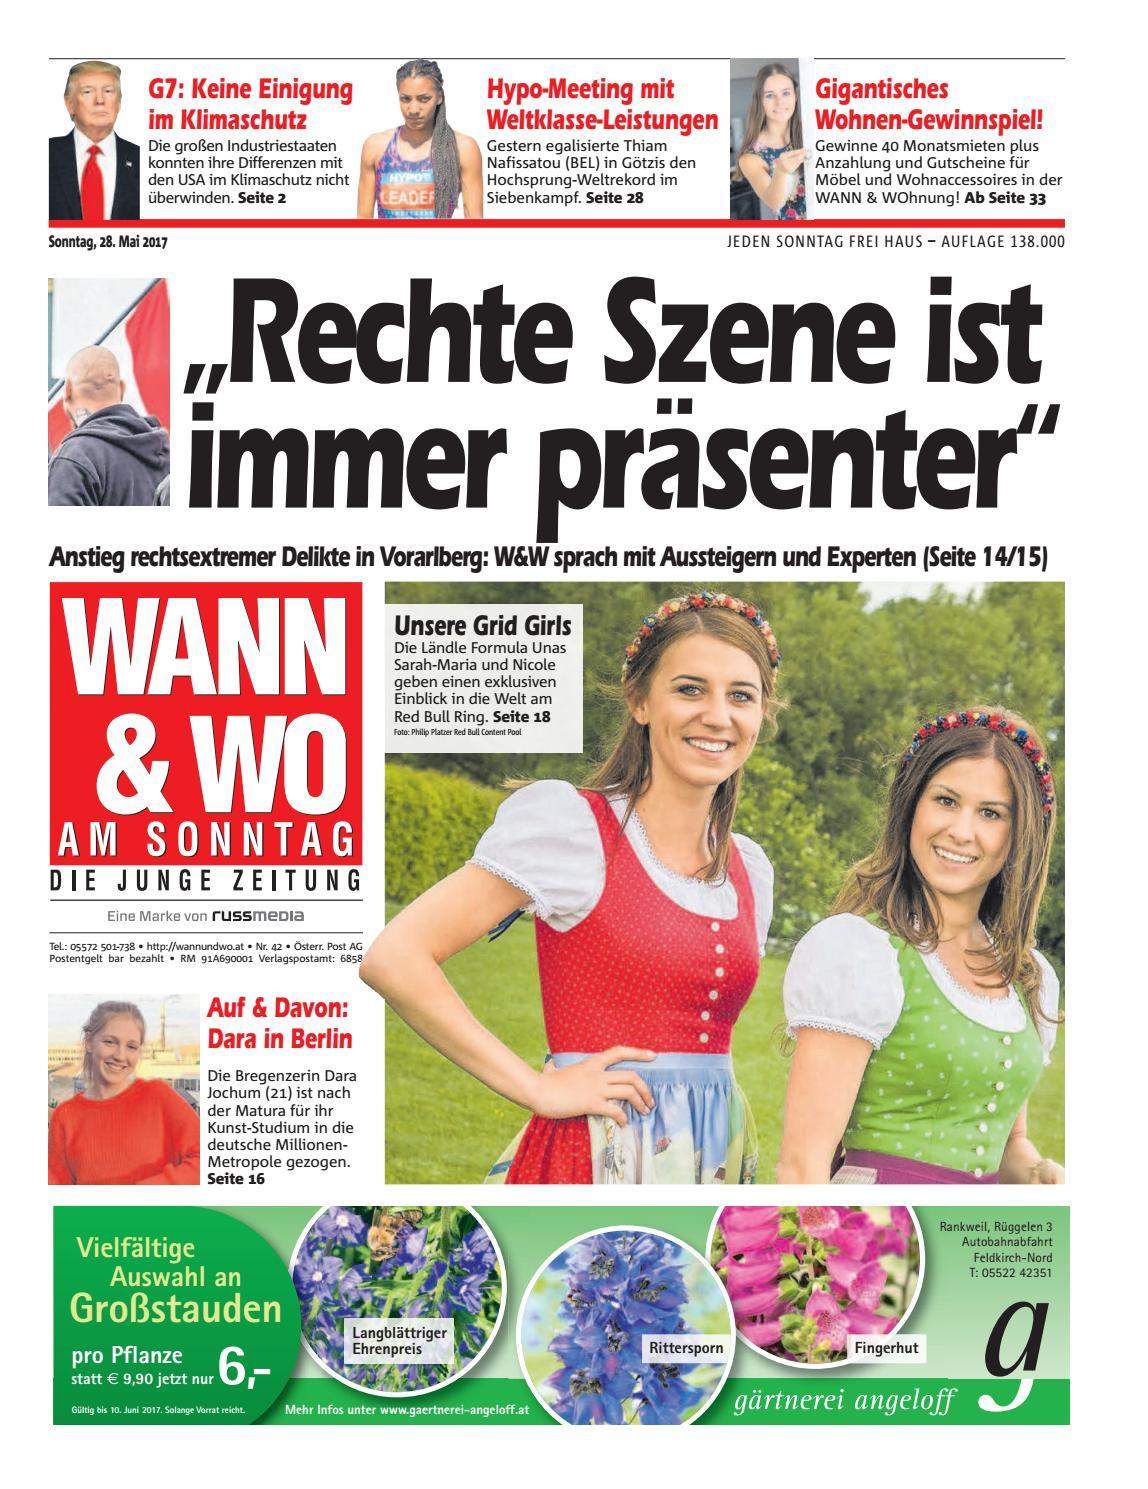 Single kino aus rohrbach bei mattersburg Dating berry